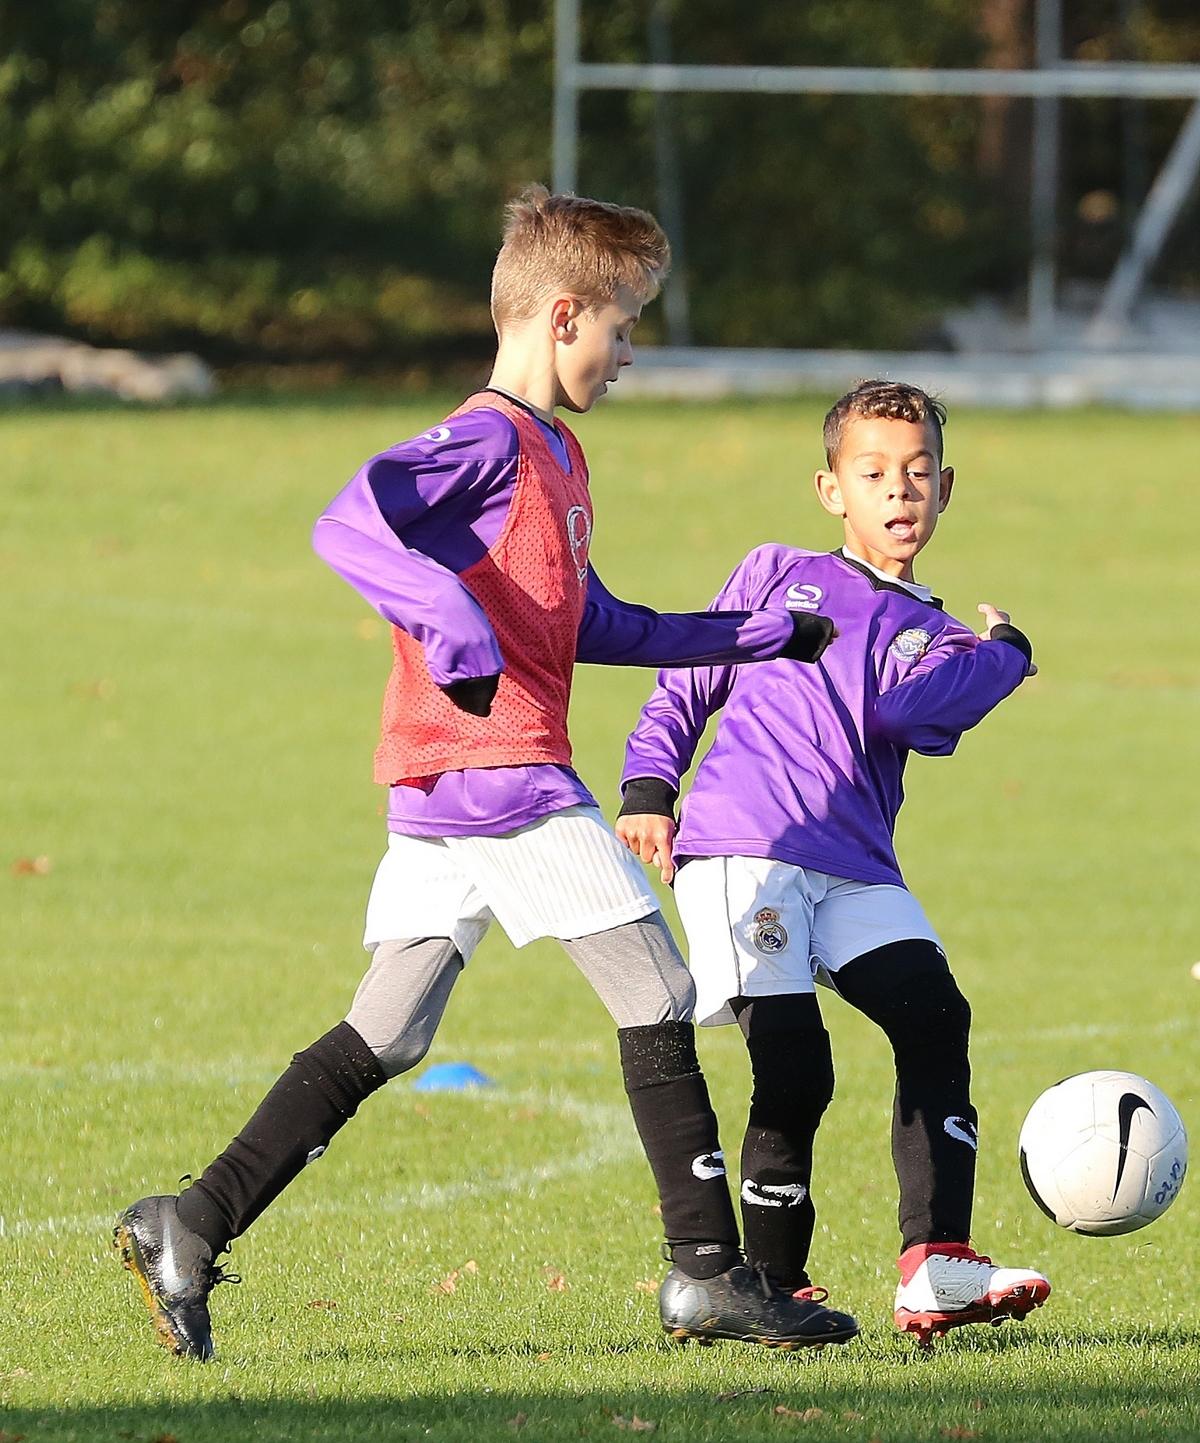 WHFC Youth Development Teams